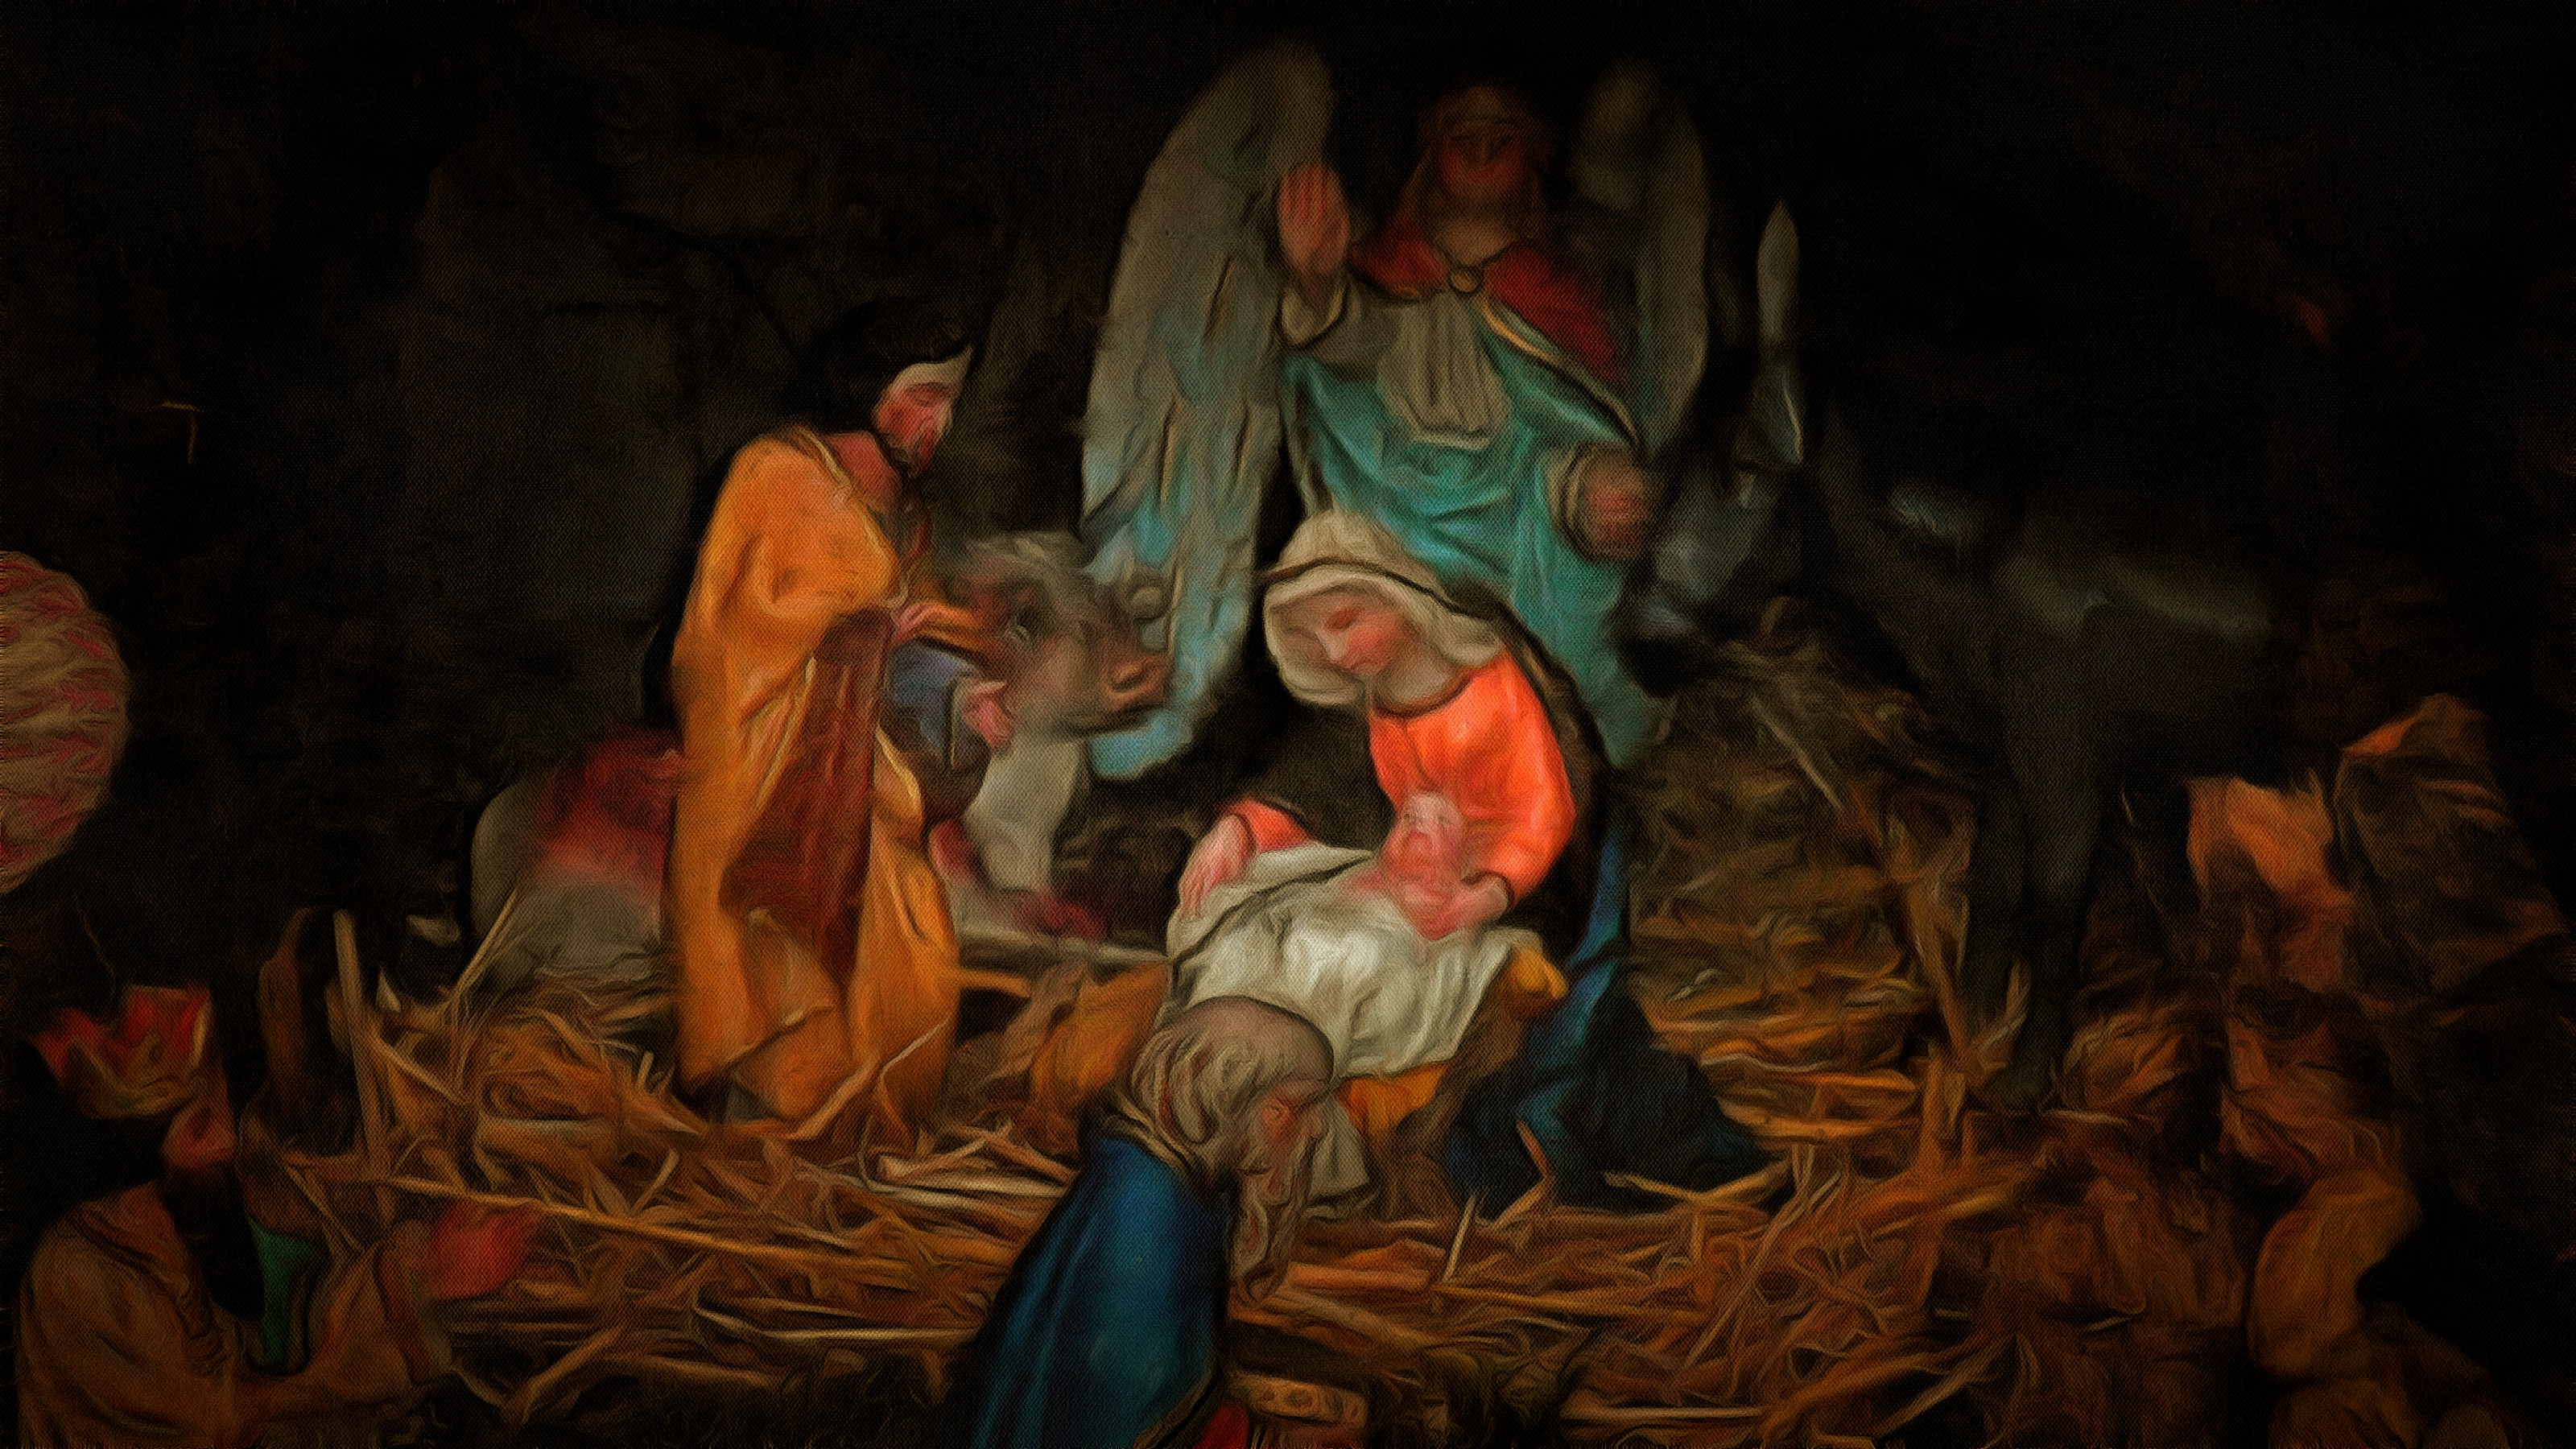 Vánoce za starých časů